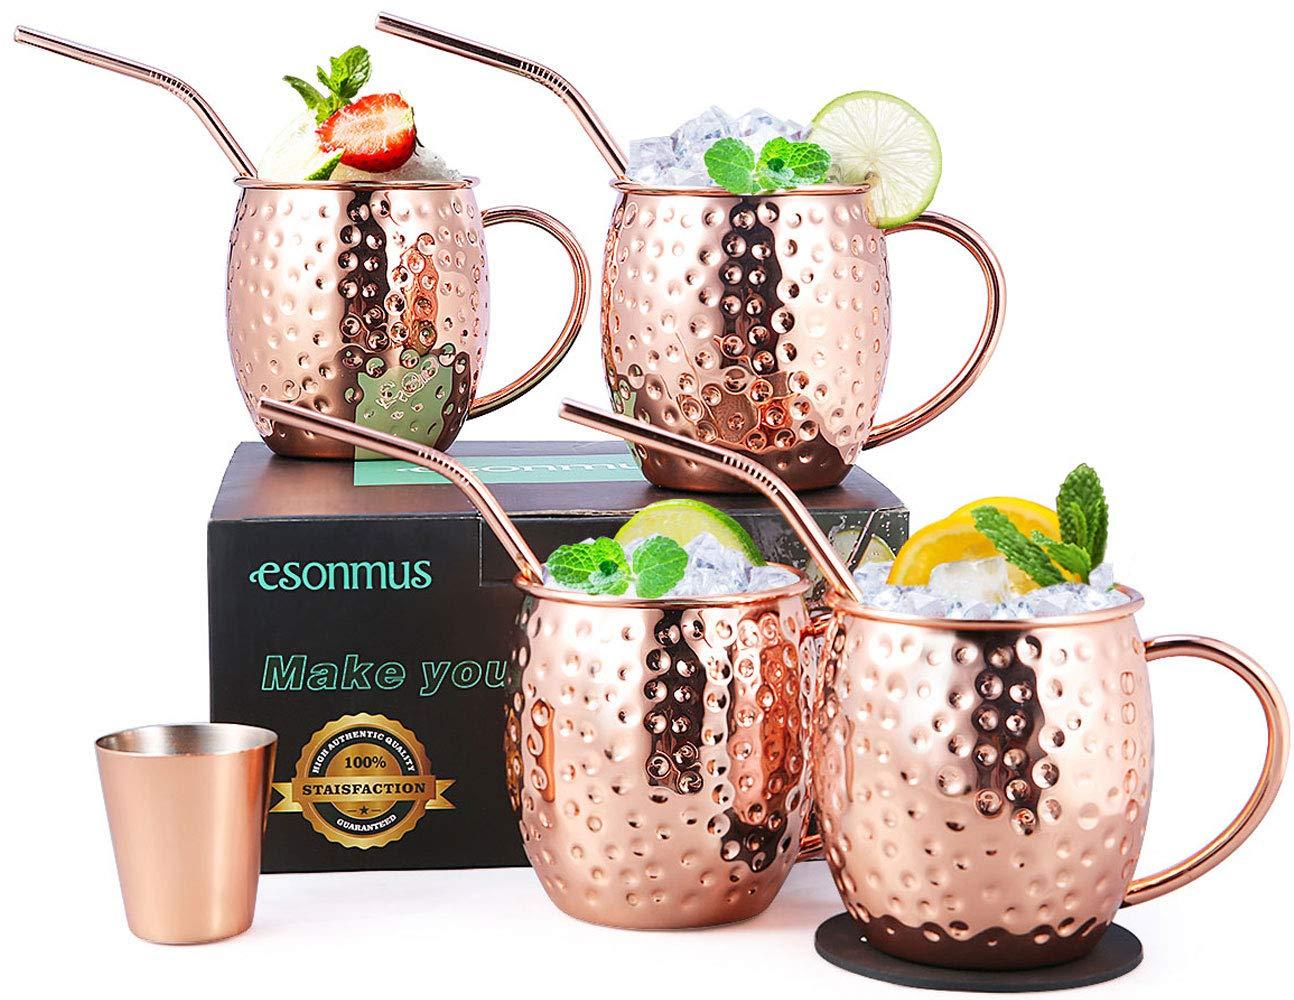 Moscow Mule Copper Mugs, esonmus Set of 4 Handcrafted Copper Mugs for Moscow Mule Cocktail with Bonus 1 Jigger 4 Straws 4 Coasters